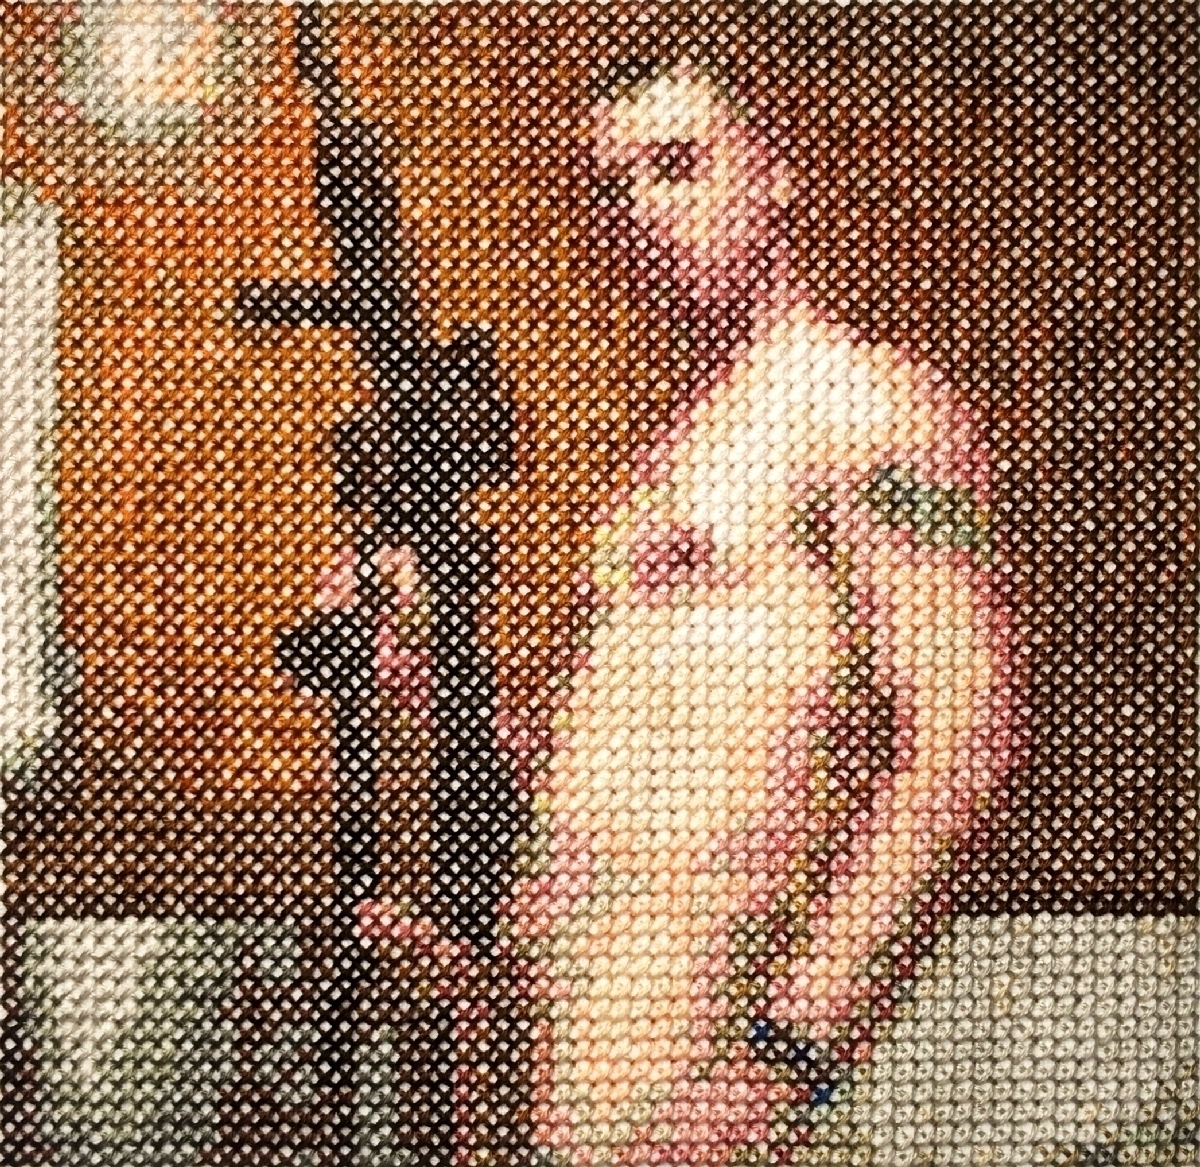 commando 3, cross stitch, 5 1/4 - aubrey | ello